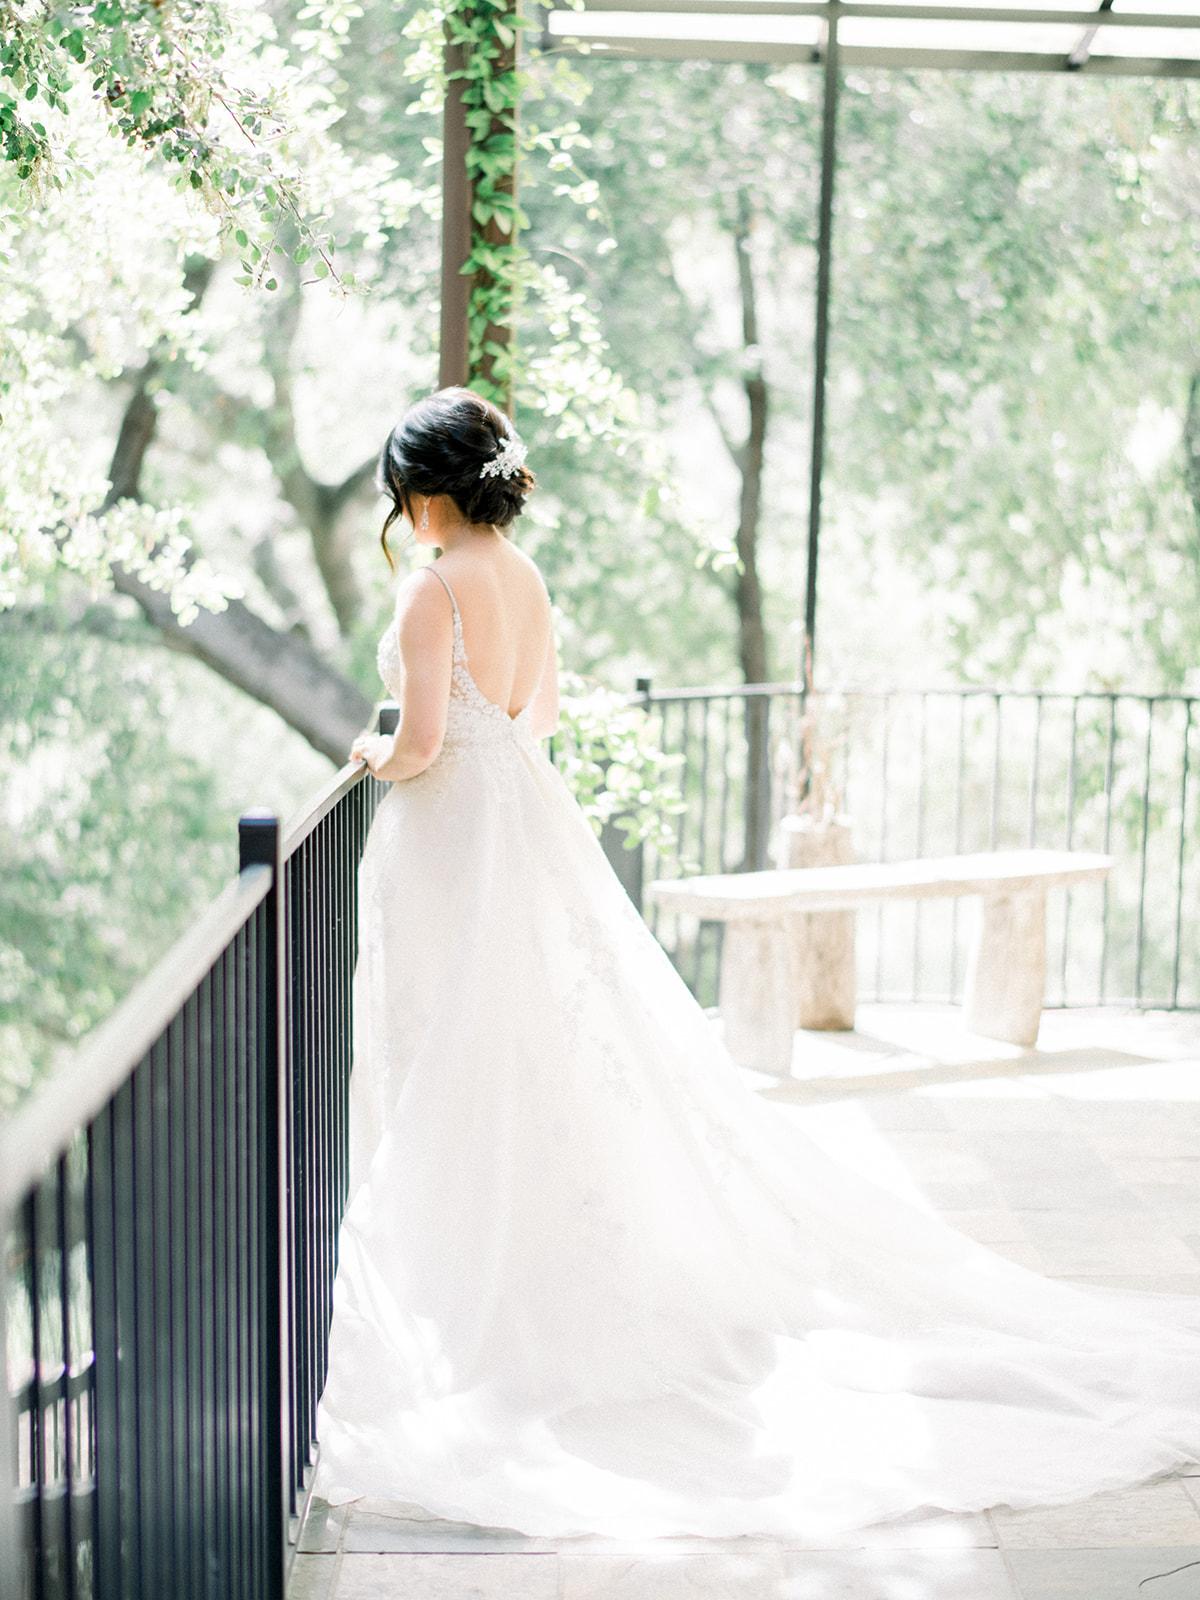 jueunandjon-etherandsmith-wedding-255.jpg